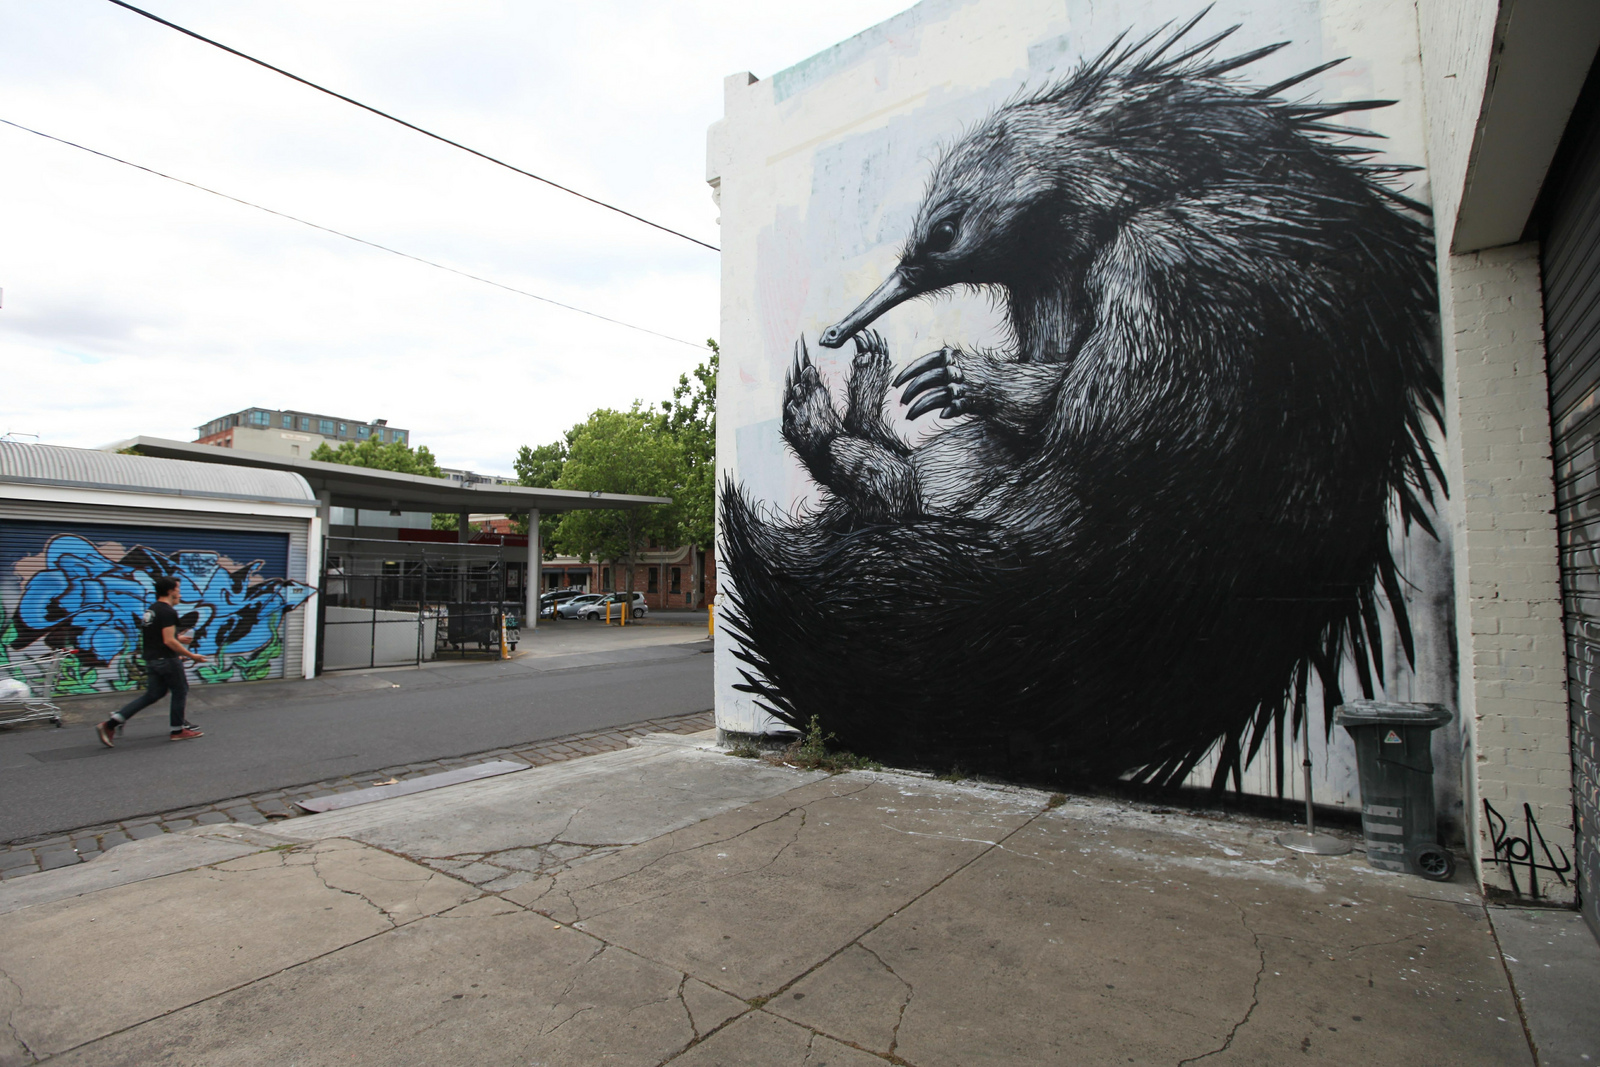 Roa new murals in melbourne australia part ii for Australian mural